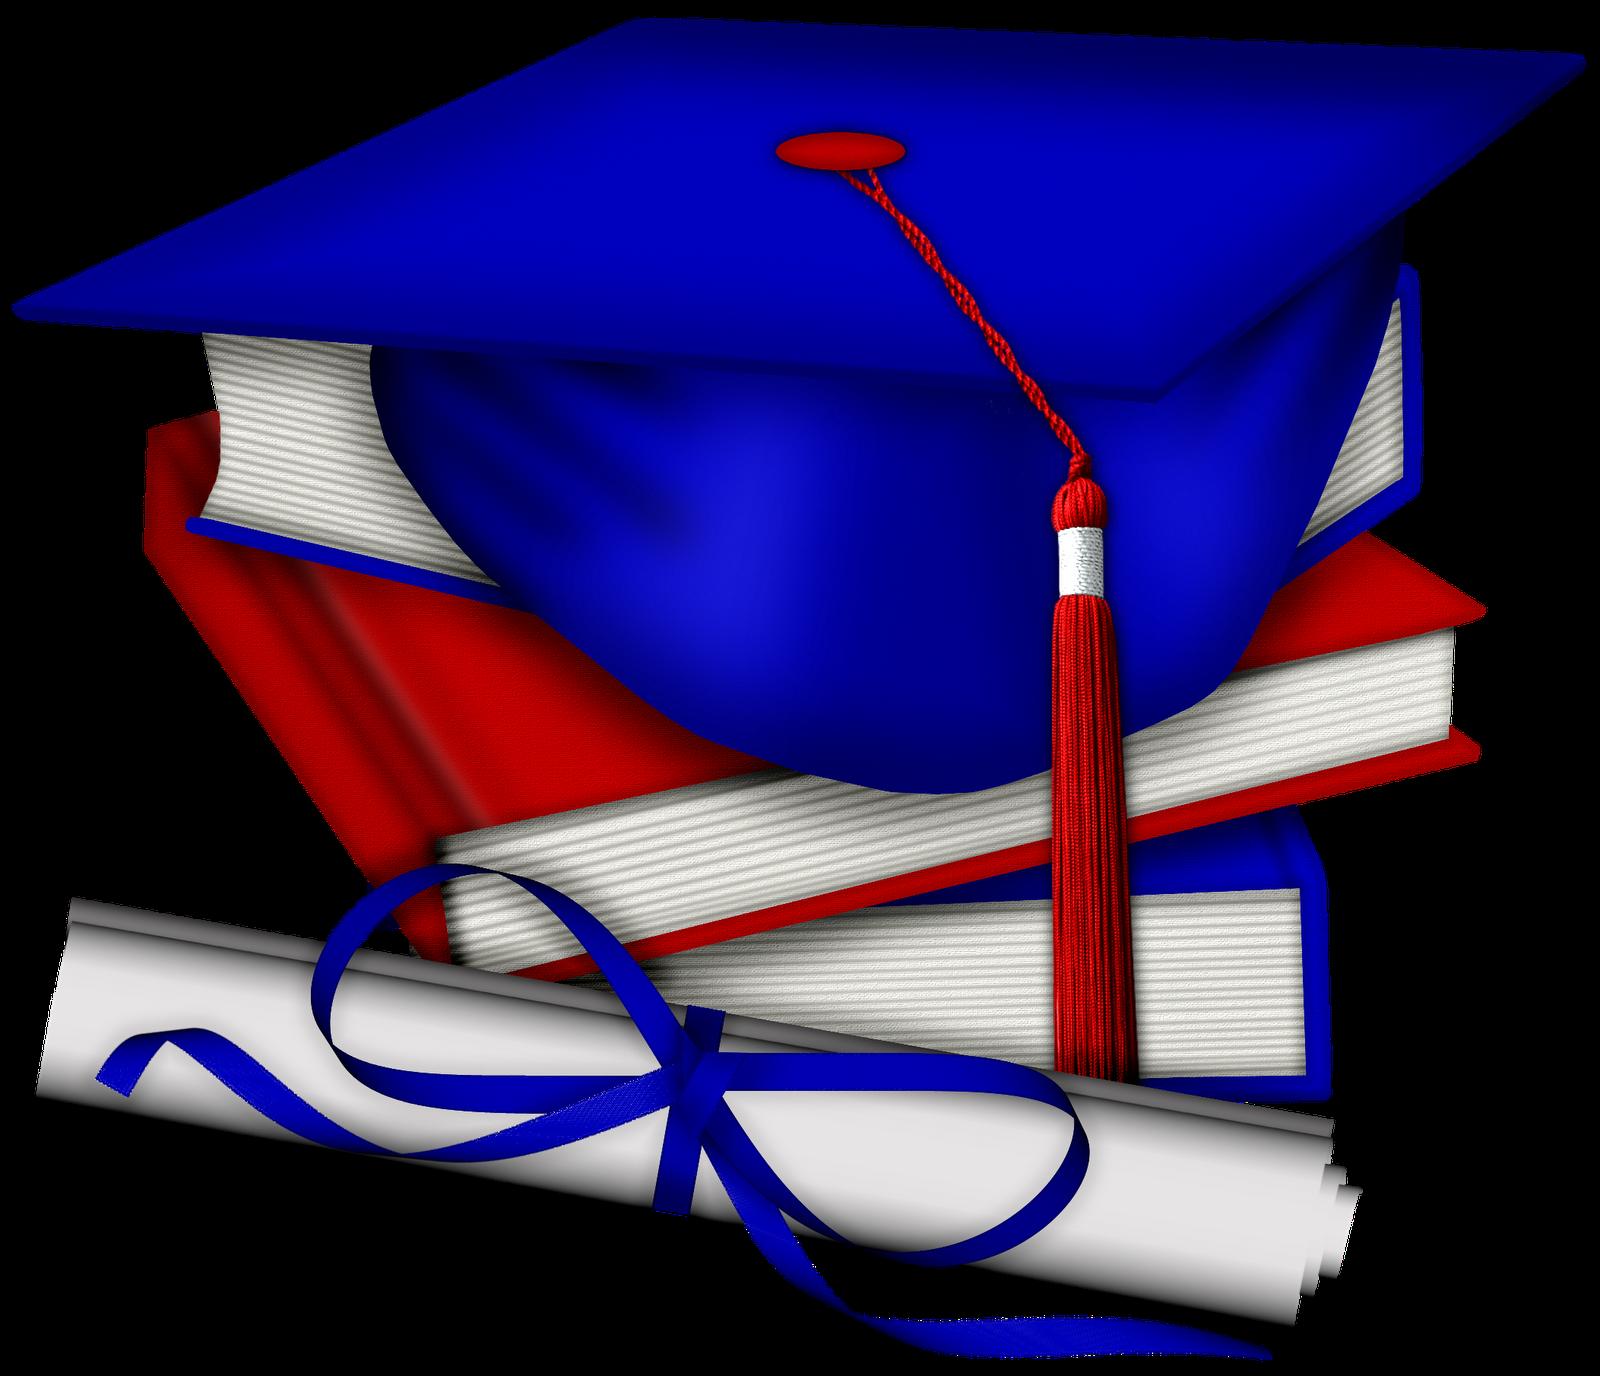 free download 2018 clipart grade 8 graduation. Border panda free images